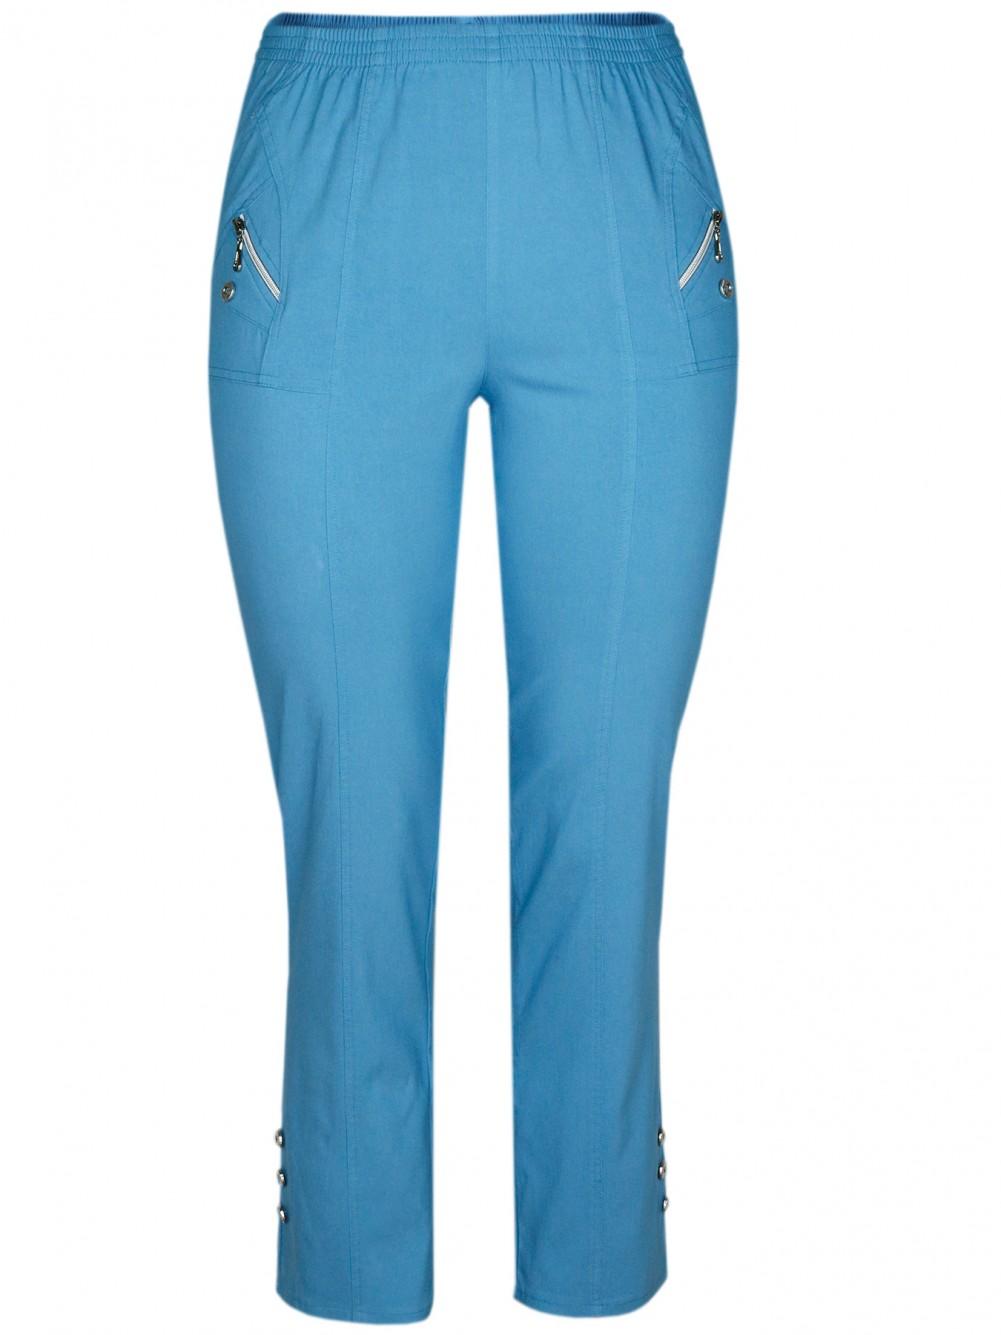 Damen Stretch Schlupfhose Sommer Kollektion - Ligth Blue